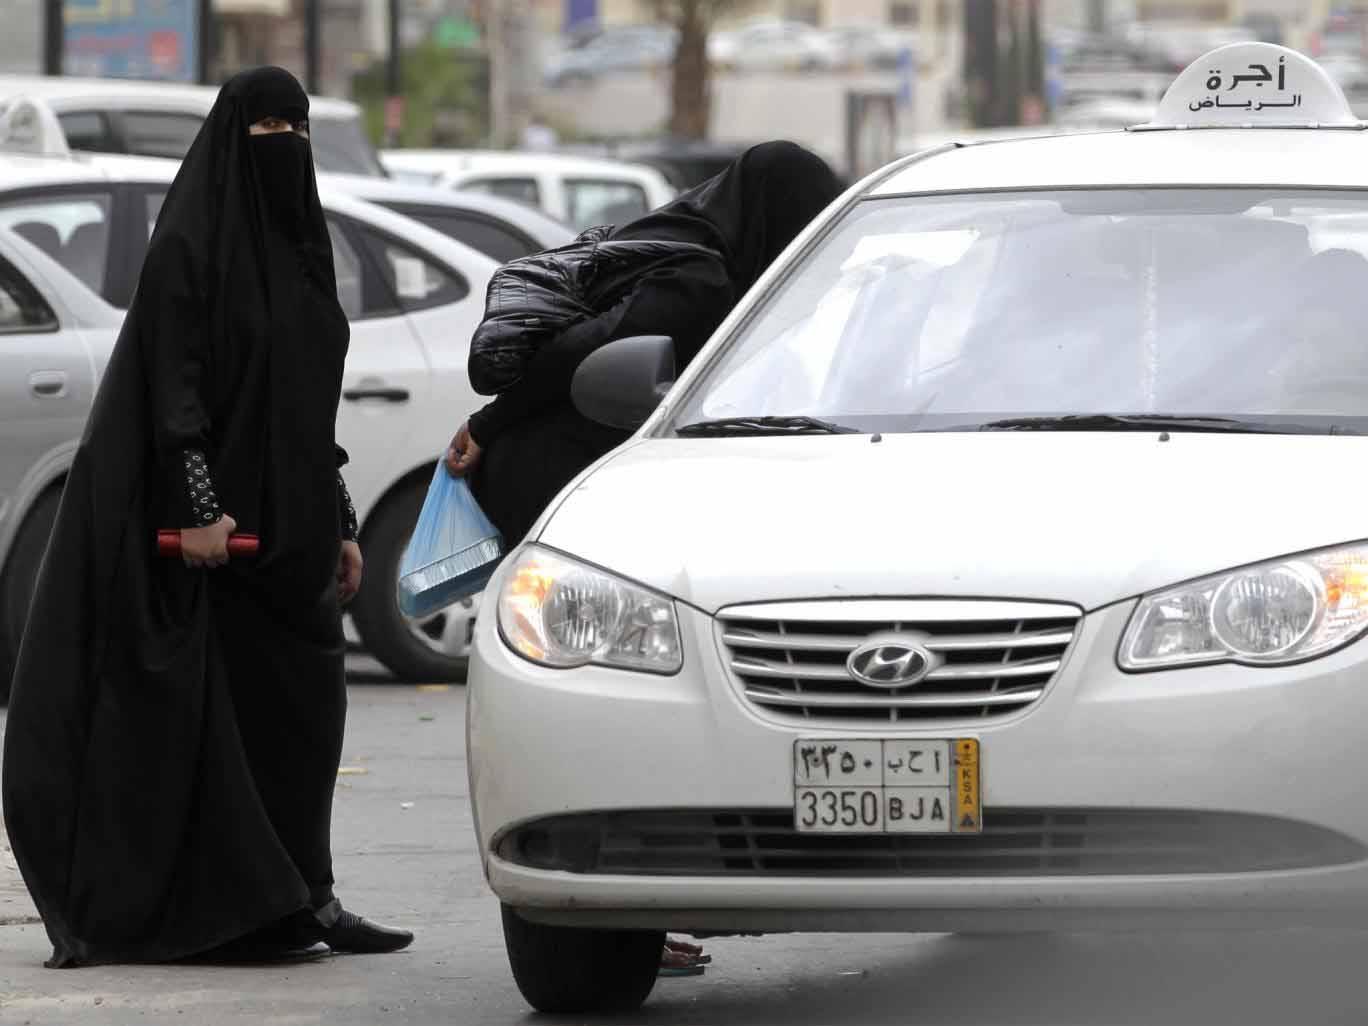 Human Rights' violation by Saudi Arabia, exposes Mubashir Luqman